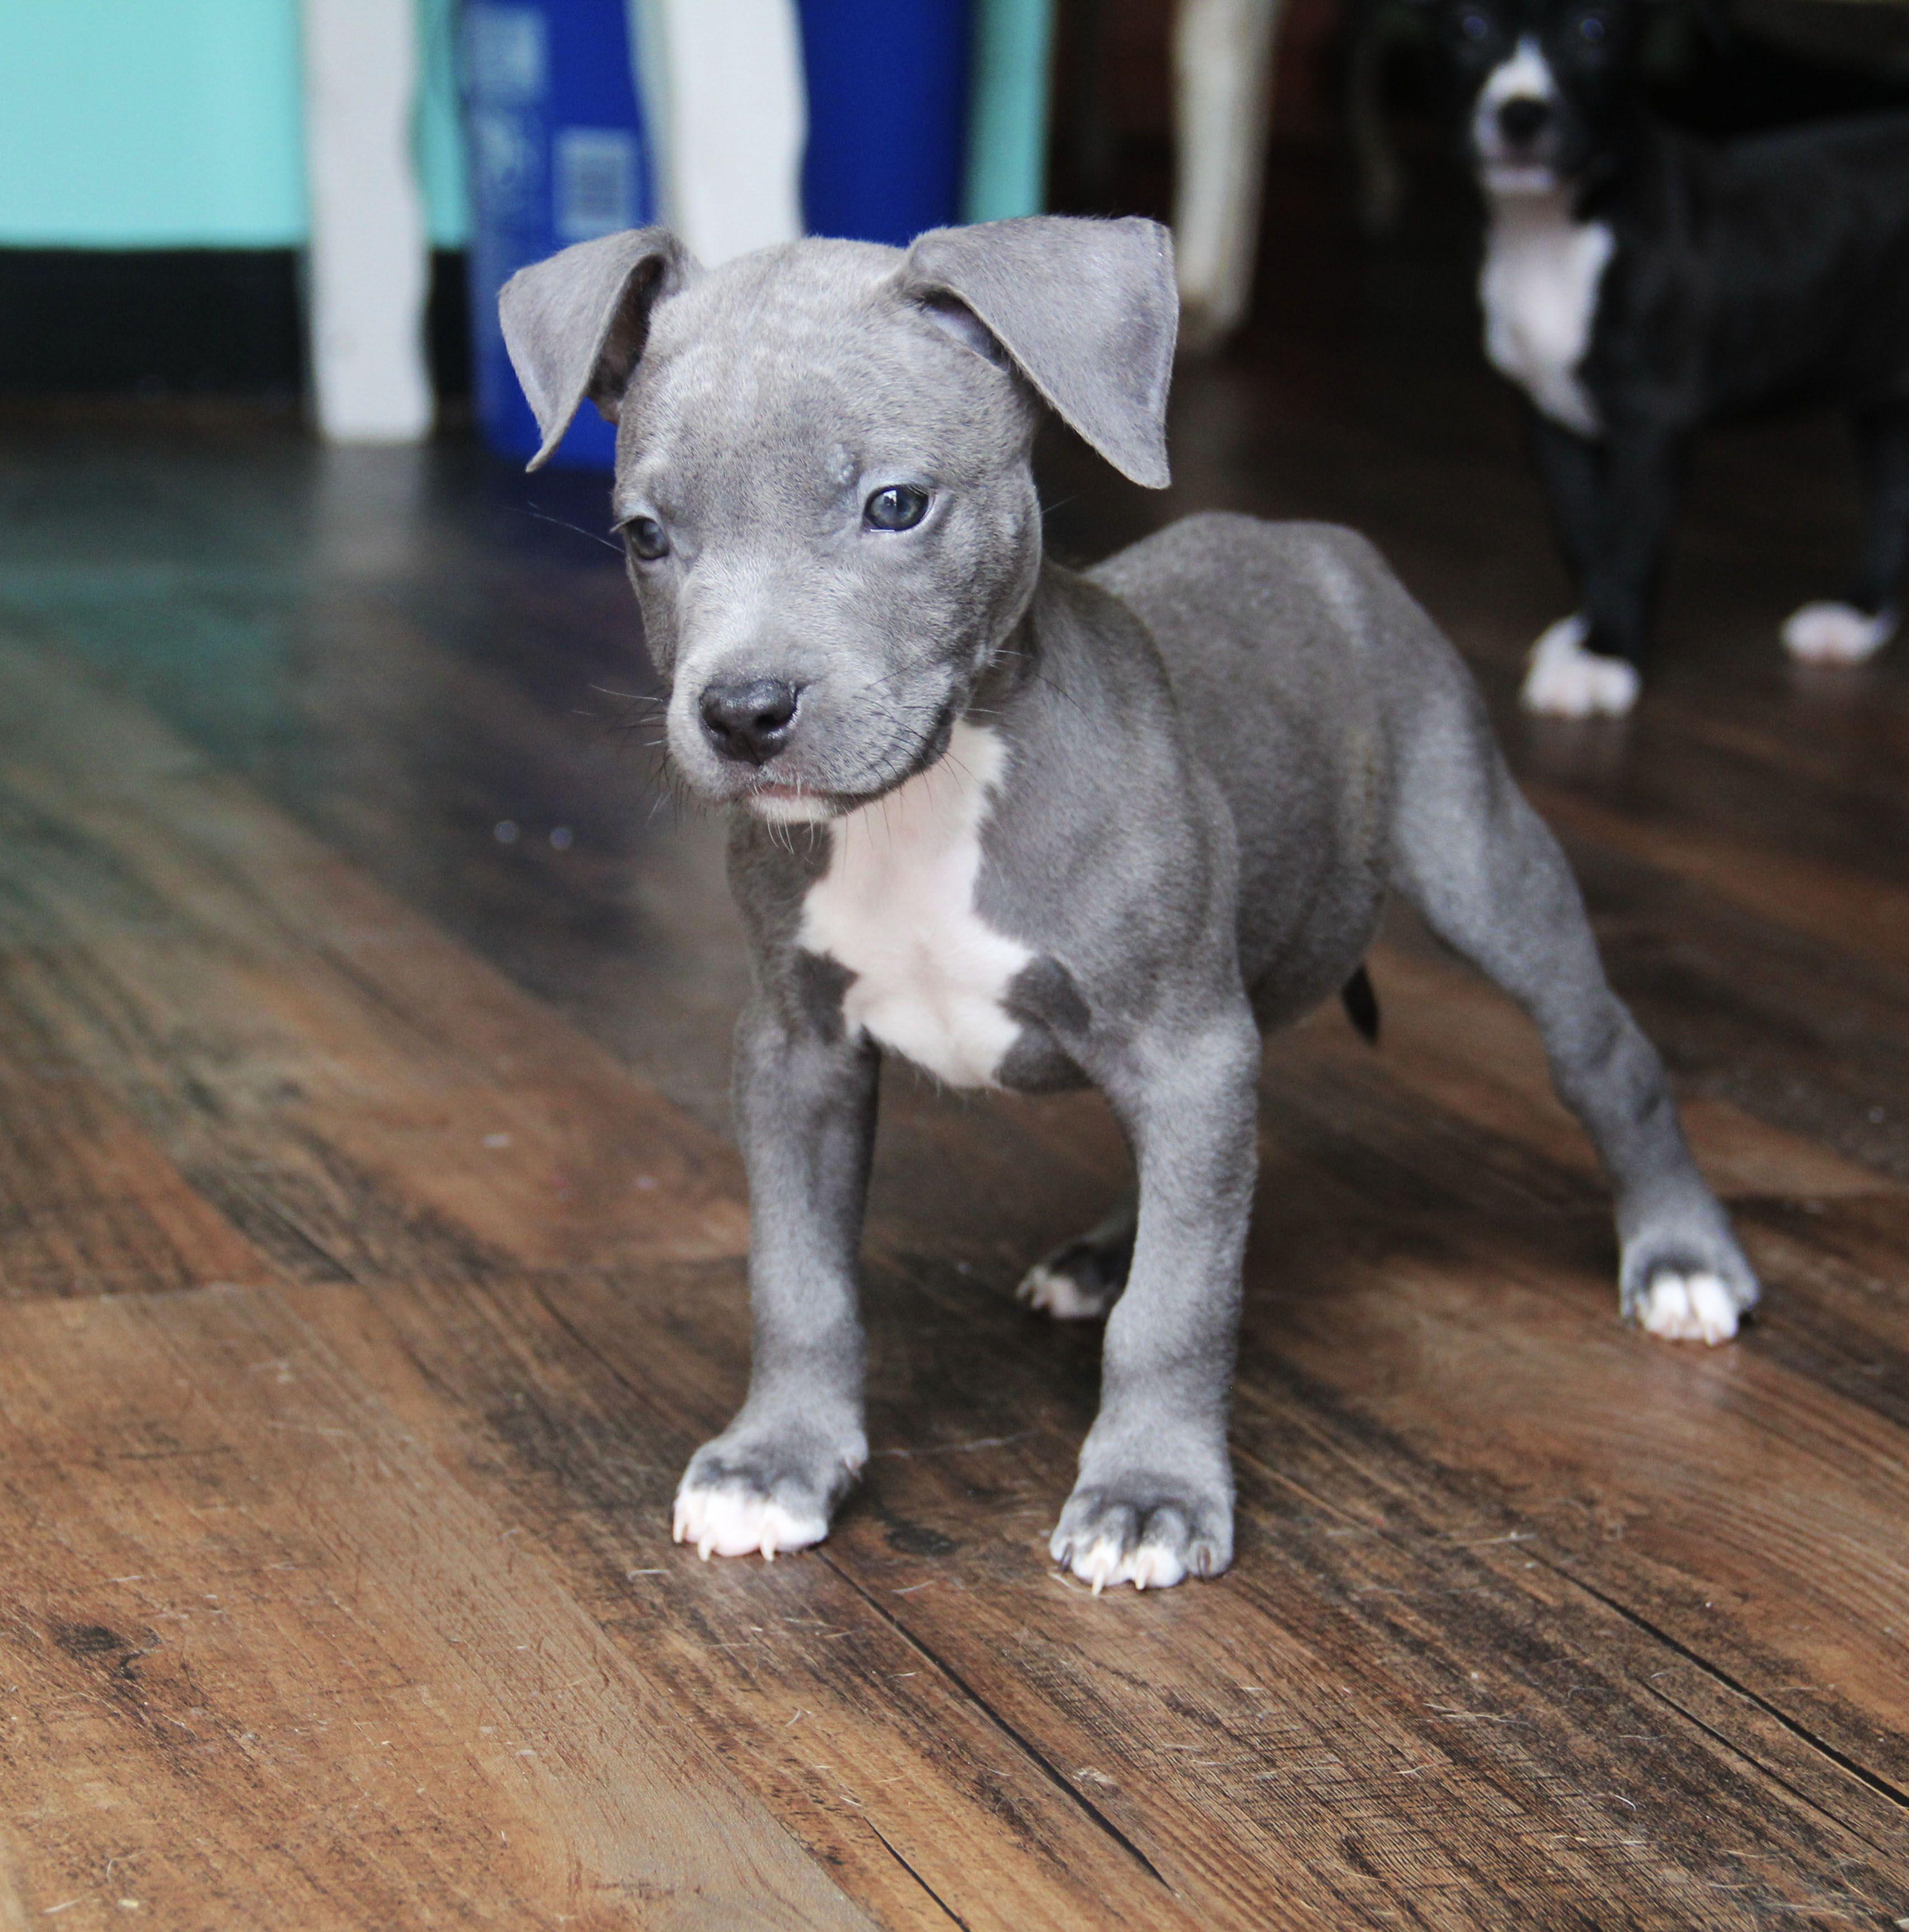 Pitbull Puppies Rescue Luxury Bacon Villalobos Rescue Center Cute Baby Animals Cute Animals